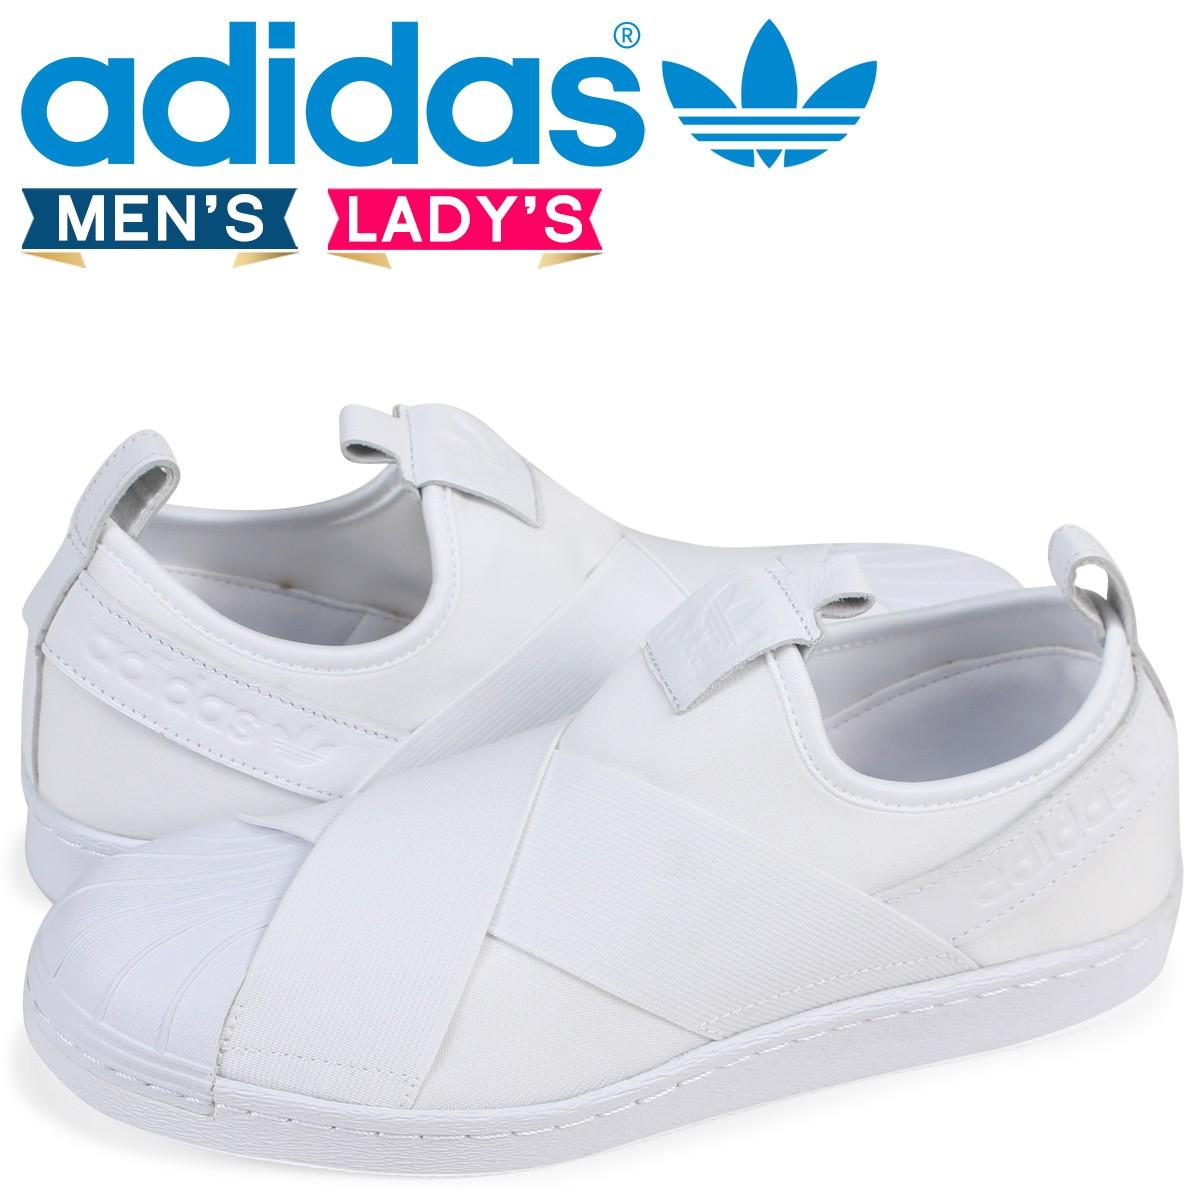 adidas Originals SUPERSTAR SLIP-ON アディダス スーパースター スニーカー スリッポン メンズ レディース BZ0111 ホワイト オリジナルス [3/20 追加入荷] [183]